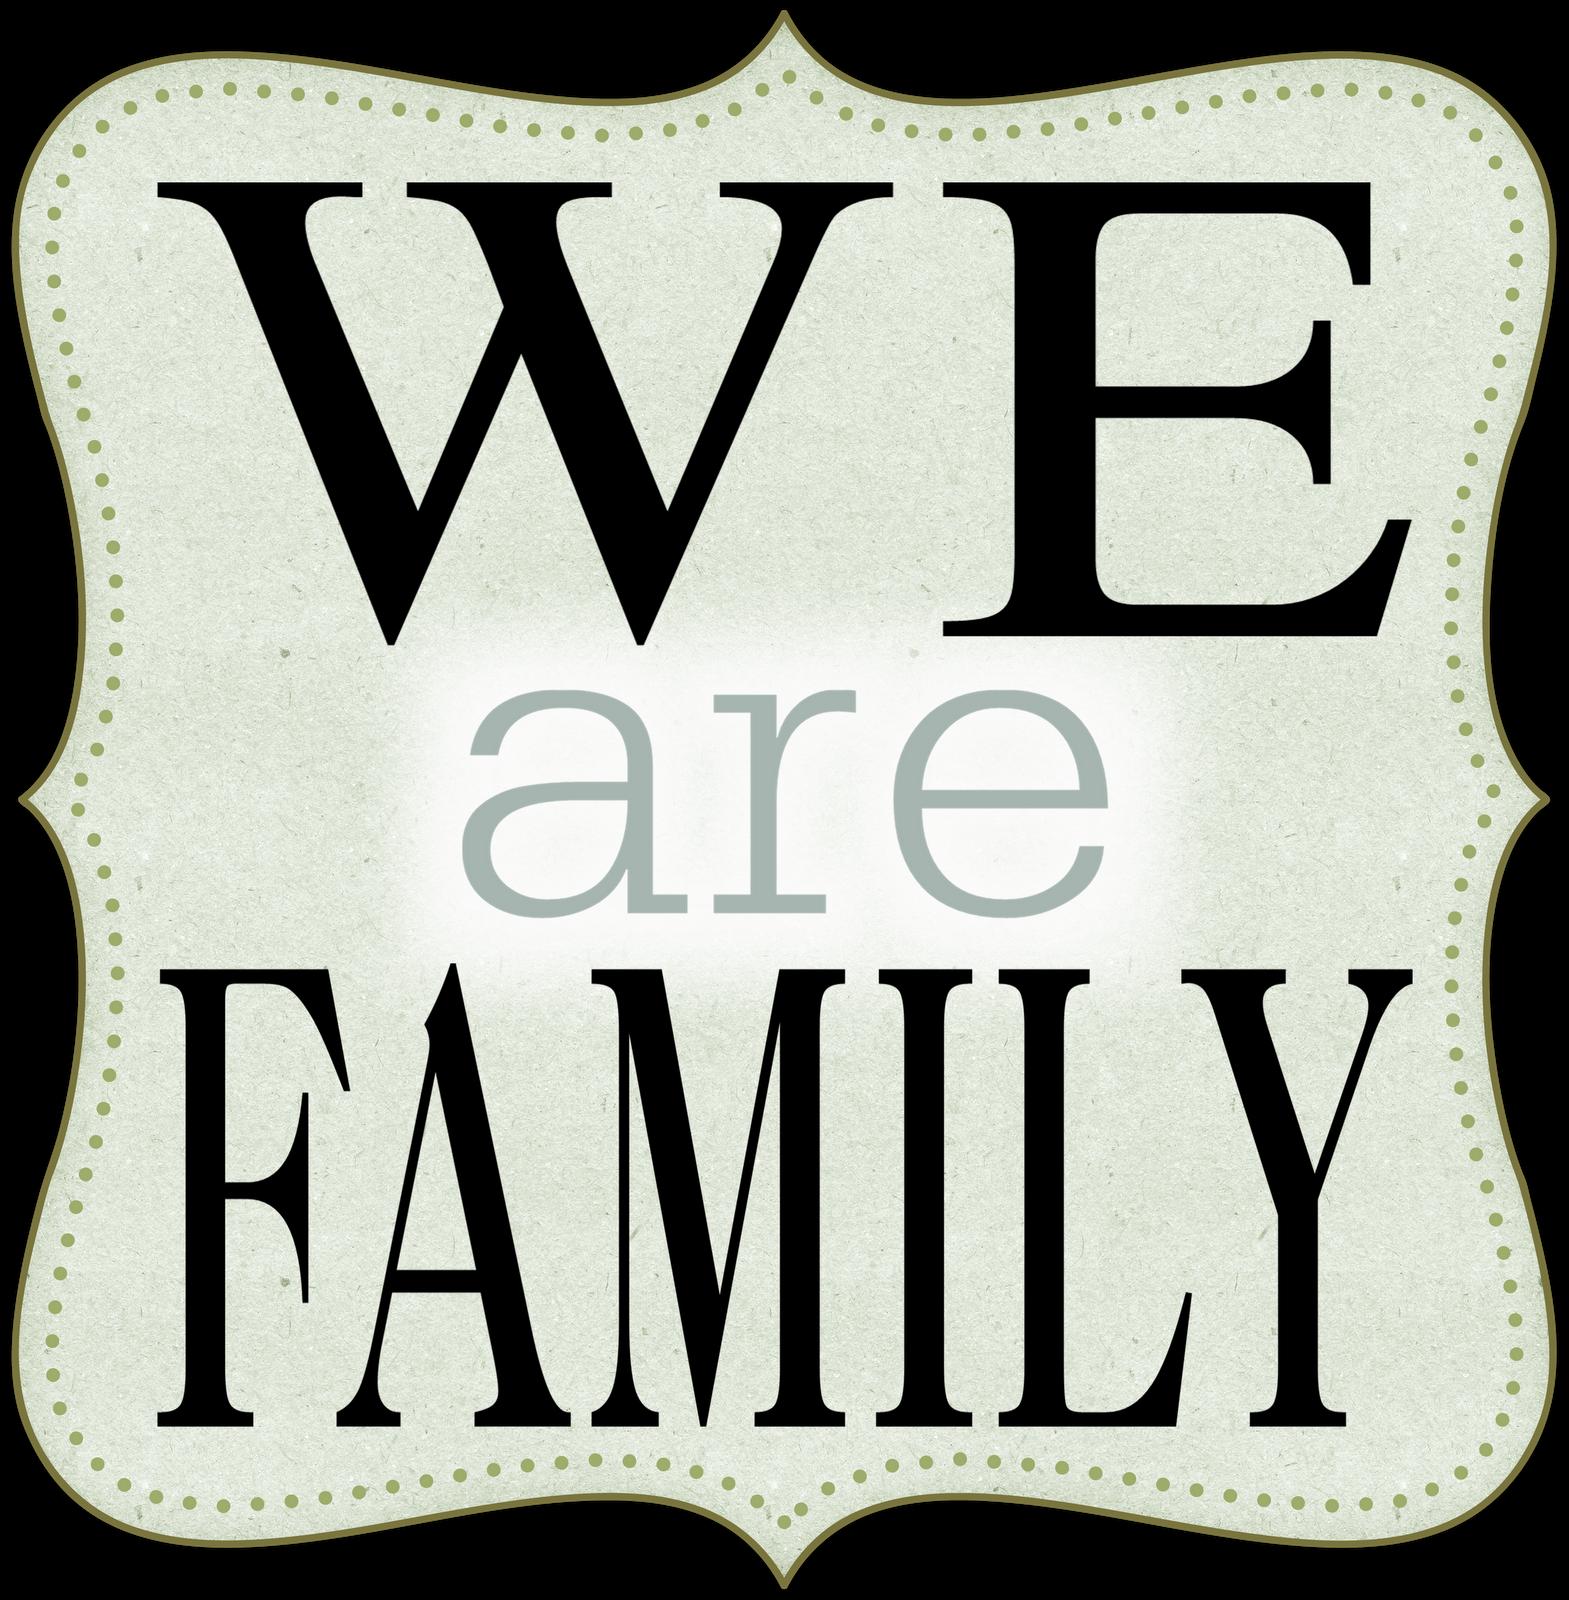 family clip art free downloads - photo #12